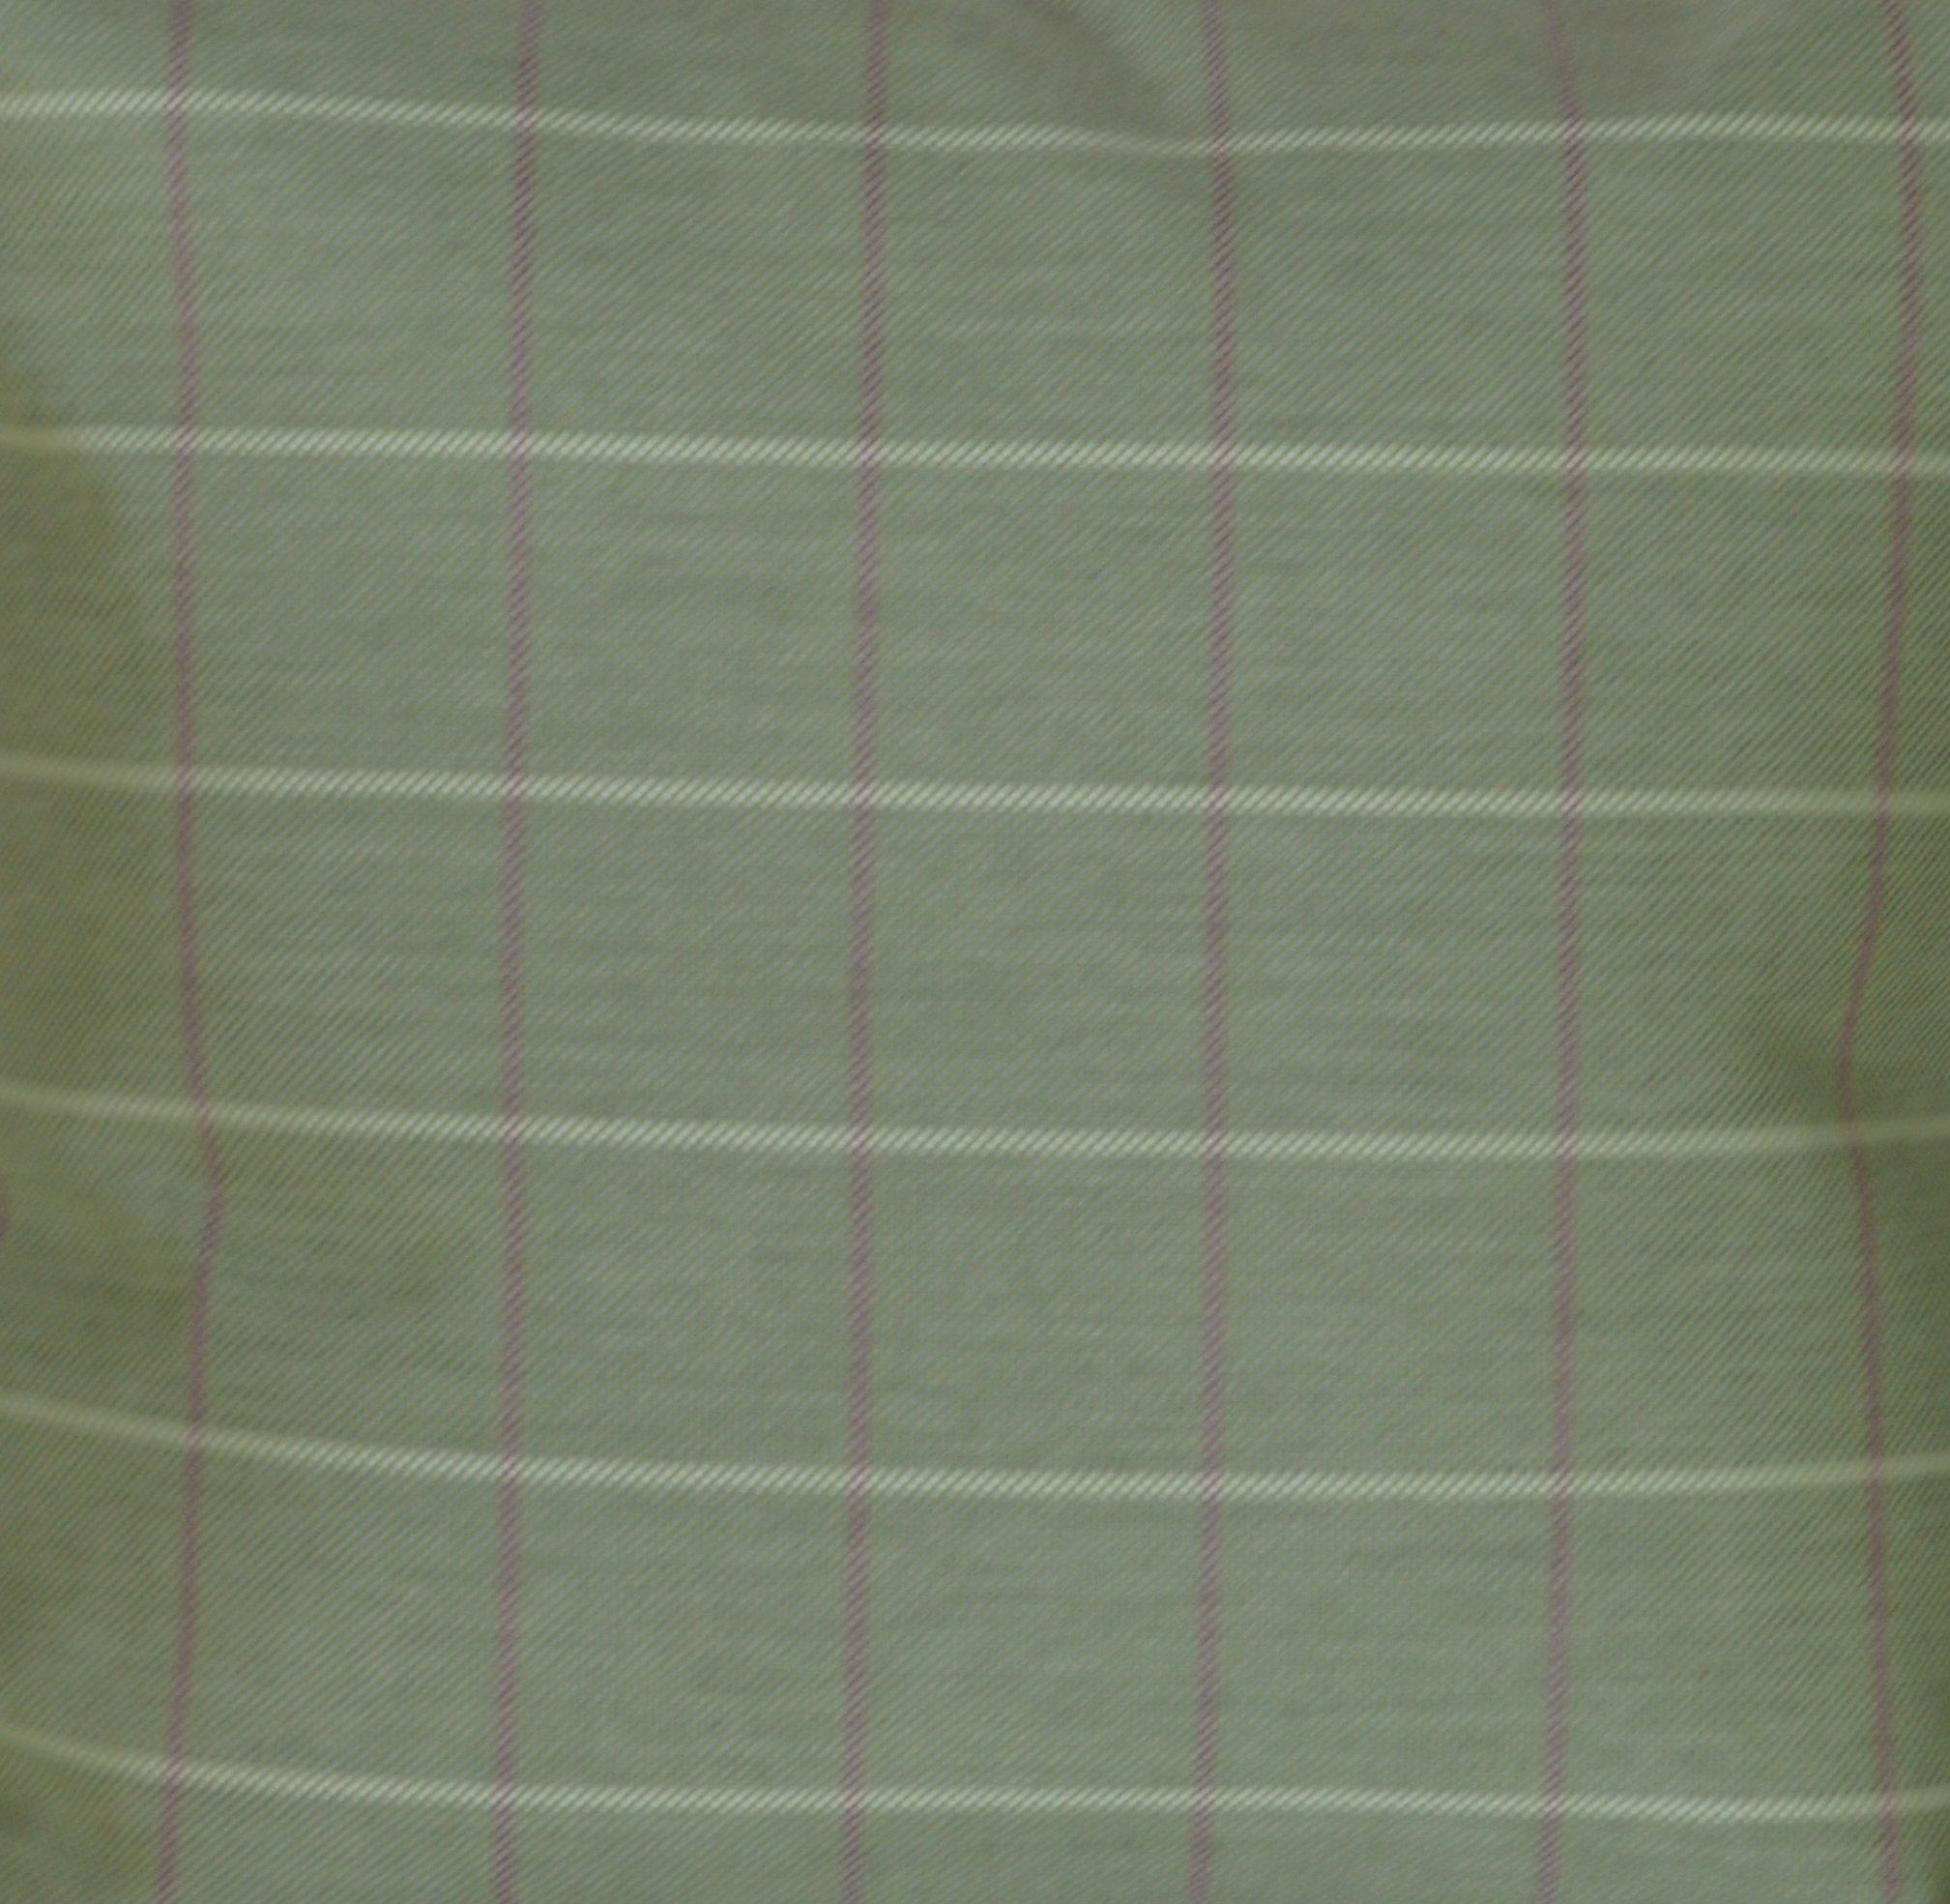 A & L Furniture Sundown Agora Pergola Curtains, 8' x 10', Cottage green